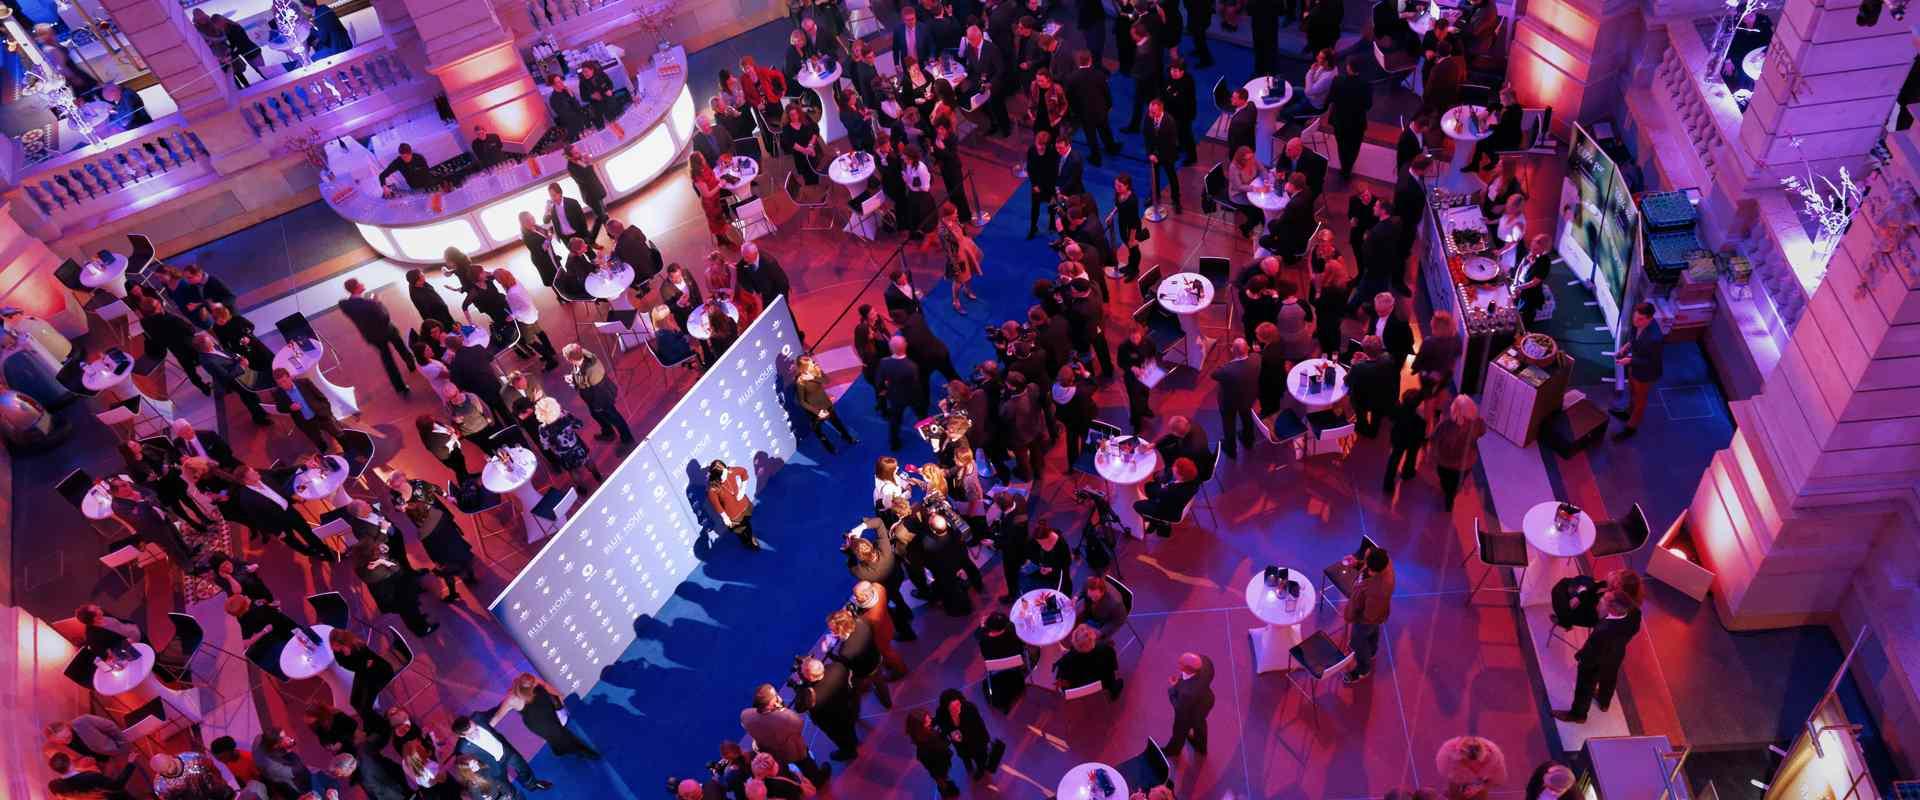 enrio – Event-Tool und Gäste-Management-Software